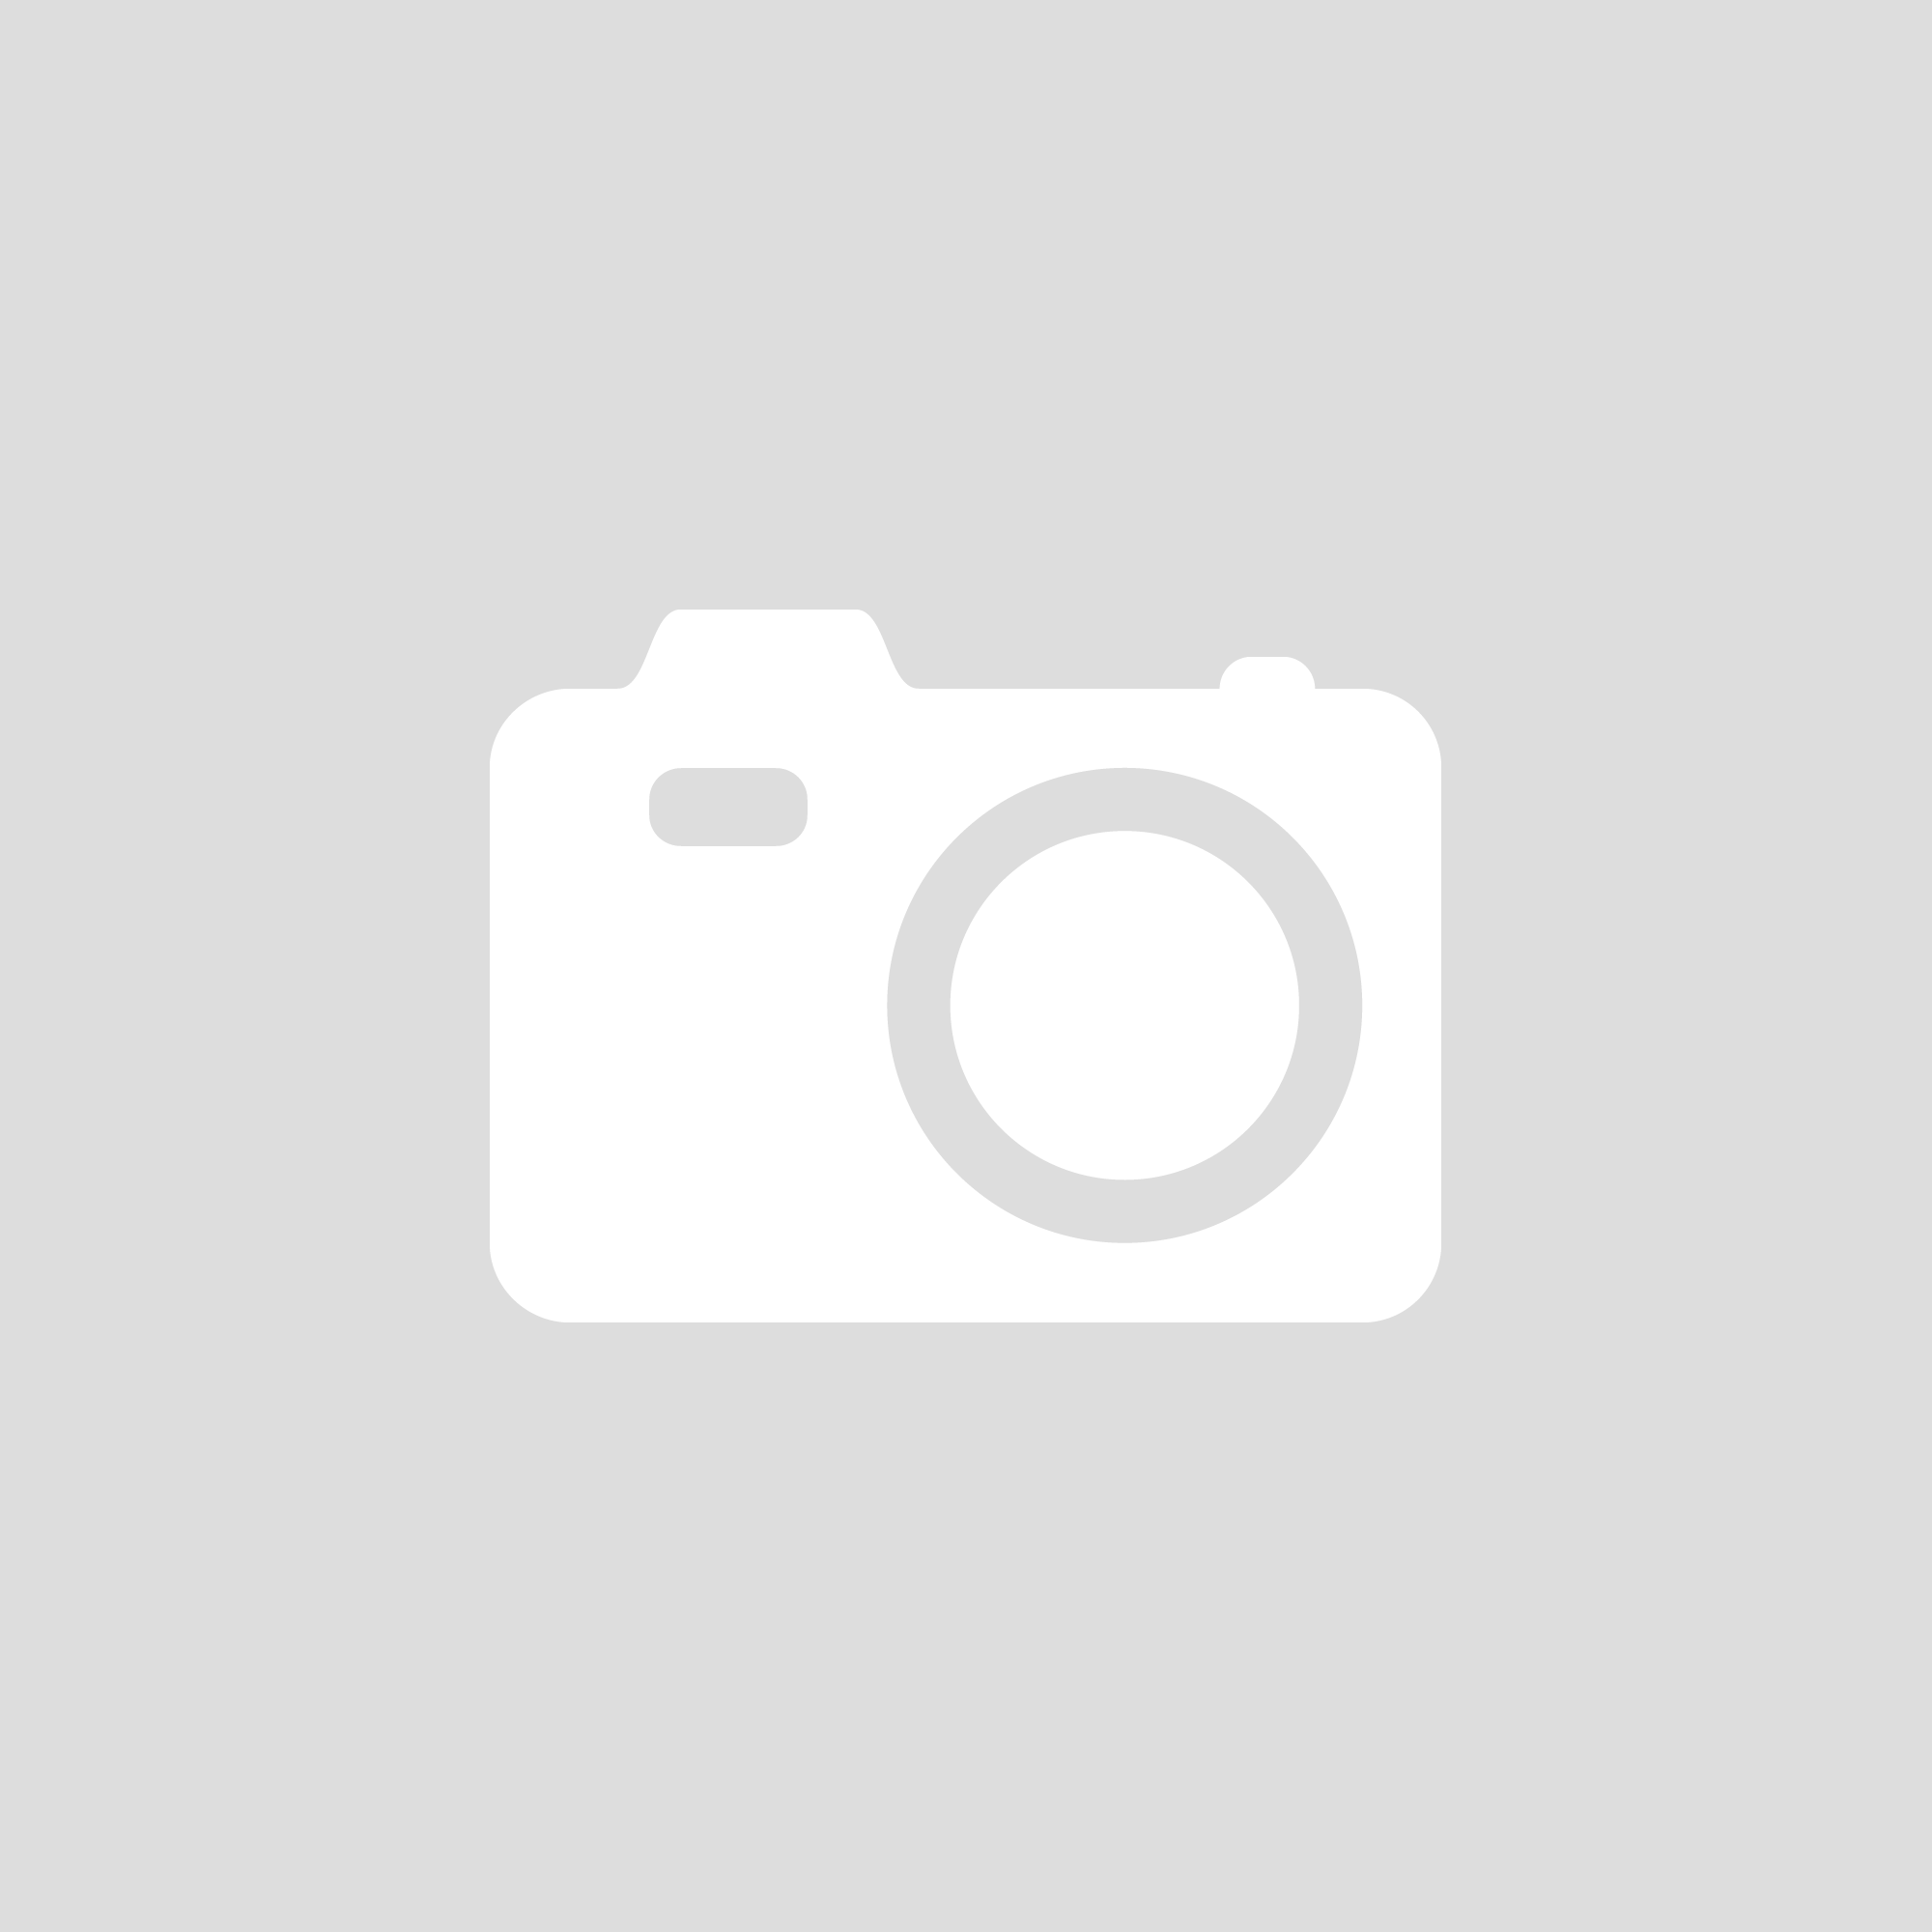 Sensation Plain Lilac Wallpaper by GranDeco 227200